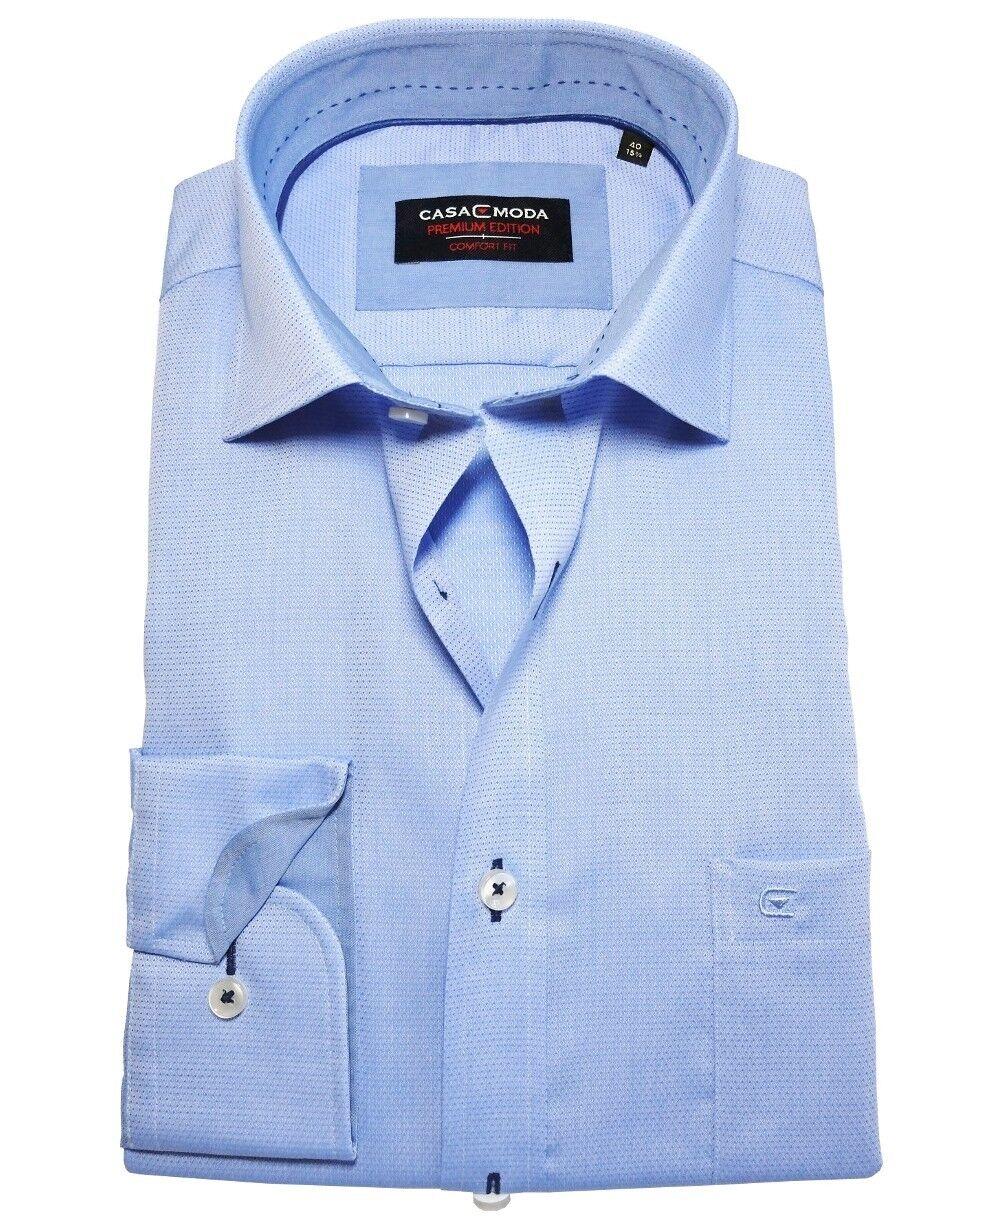 Casa Moda Premium Comfort Fit Langarmhemd Struktur blau Gr. 40 bis 54 bügelfrei